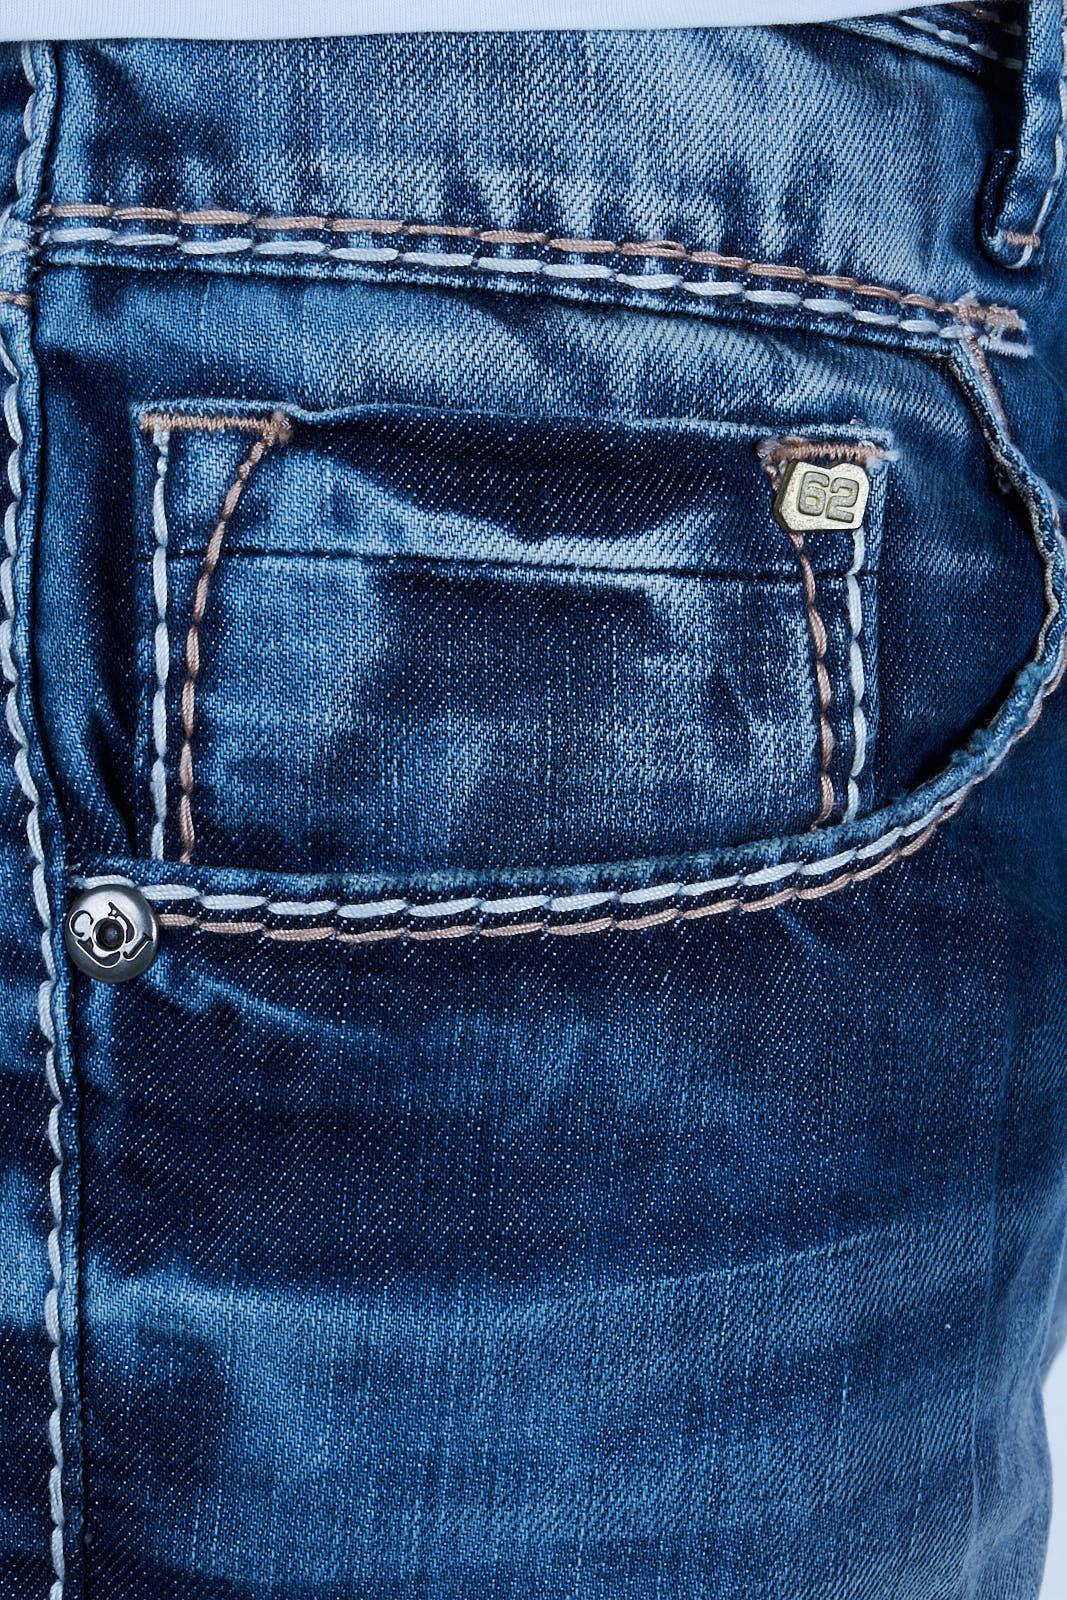 Cipo-amp-Baxx-Mens-Jeans-Clubwear-Denim-Trousers-c-1149-Straight-Thick-Seam-New-C-11 thumbnail 4